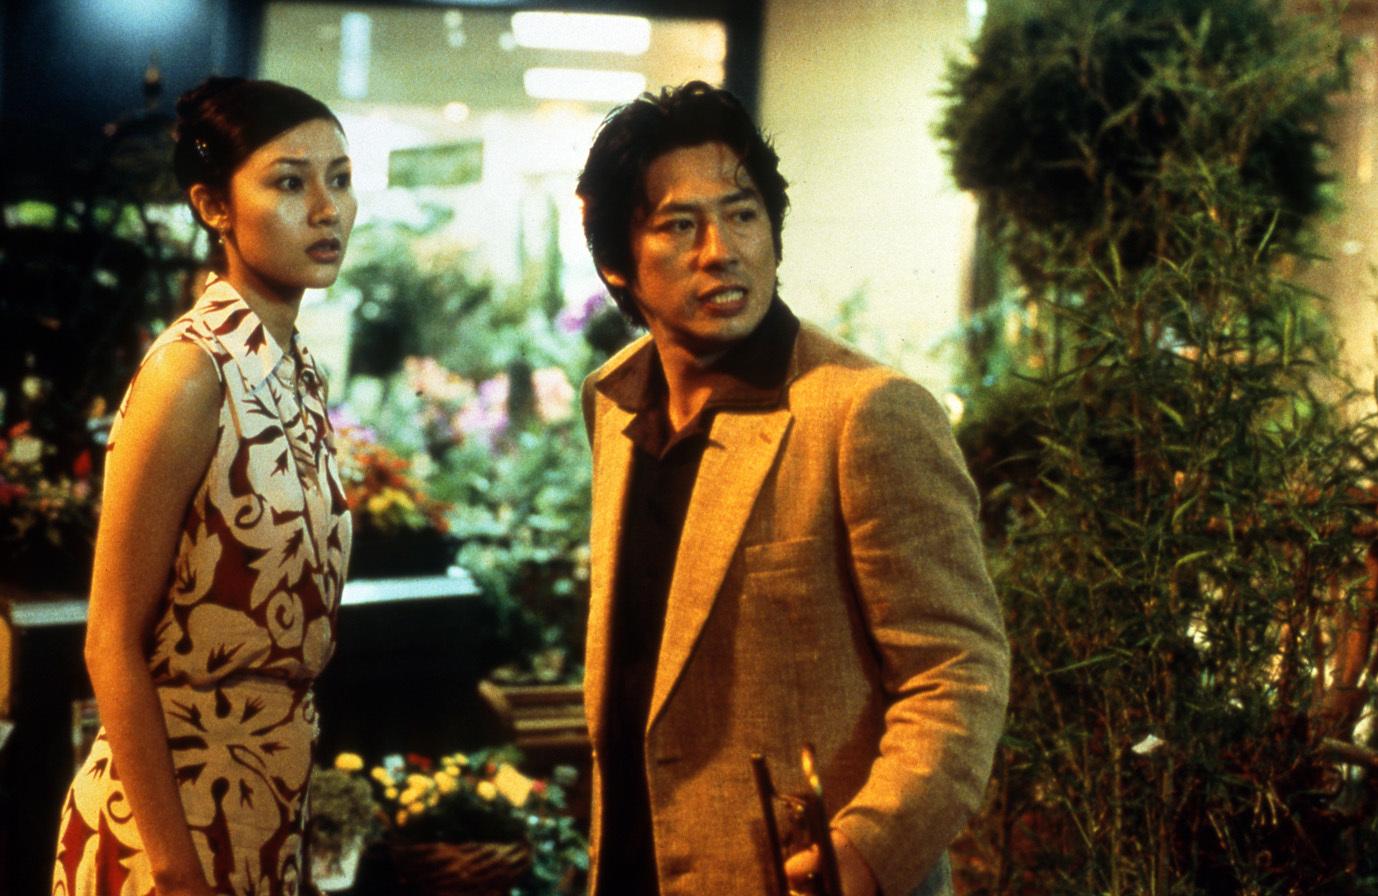 映画『真夜中まで』 (C)1999東北新社・電通・日本出版販売・IMAGICA